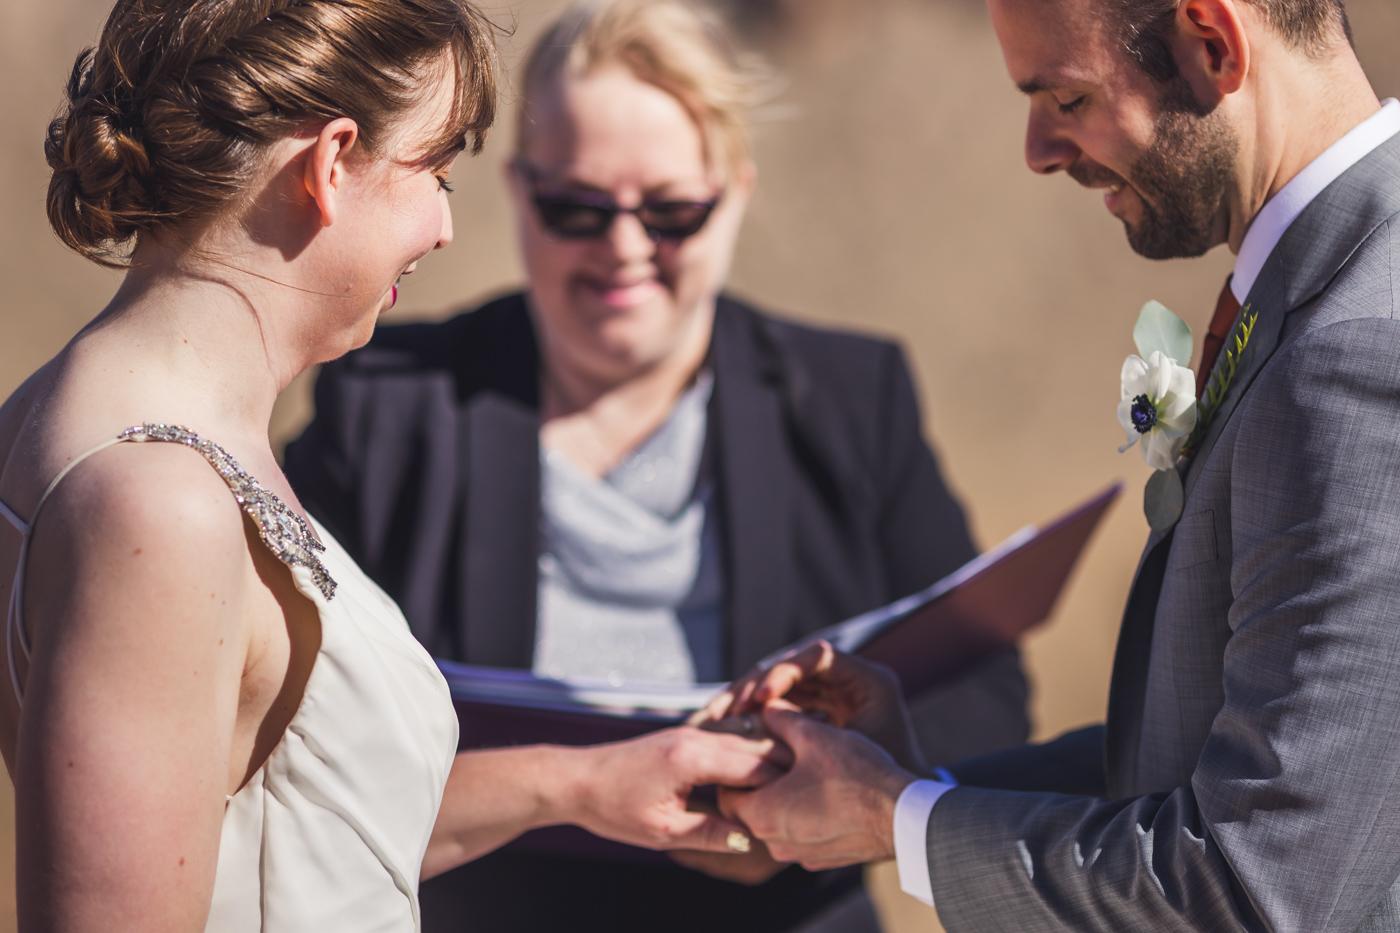 groom-putting-ring-on-bride